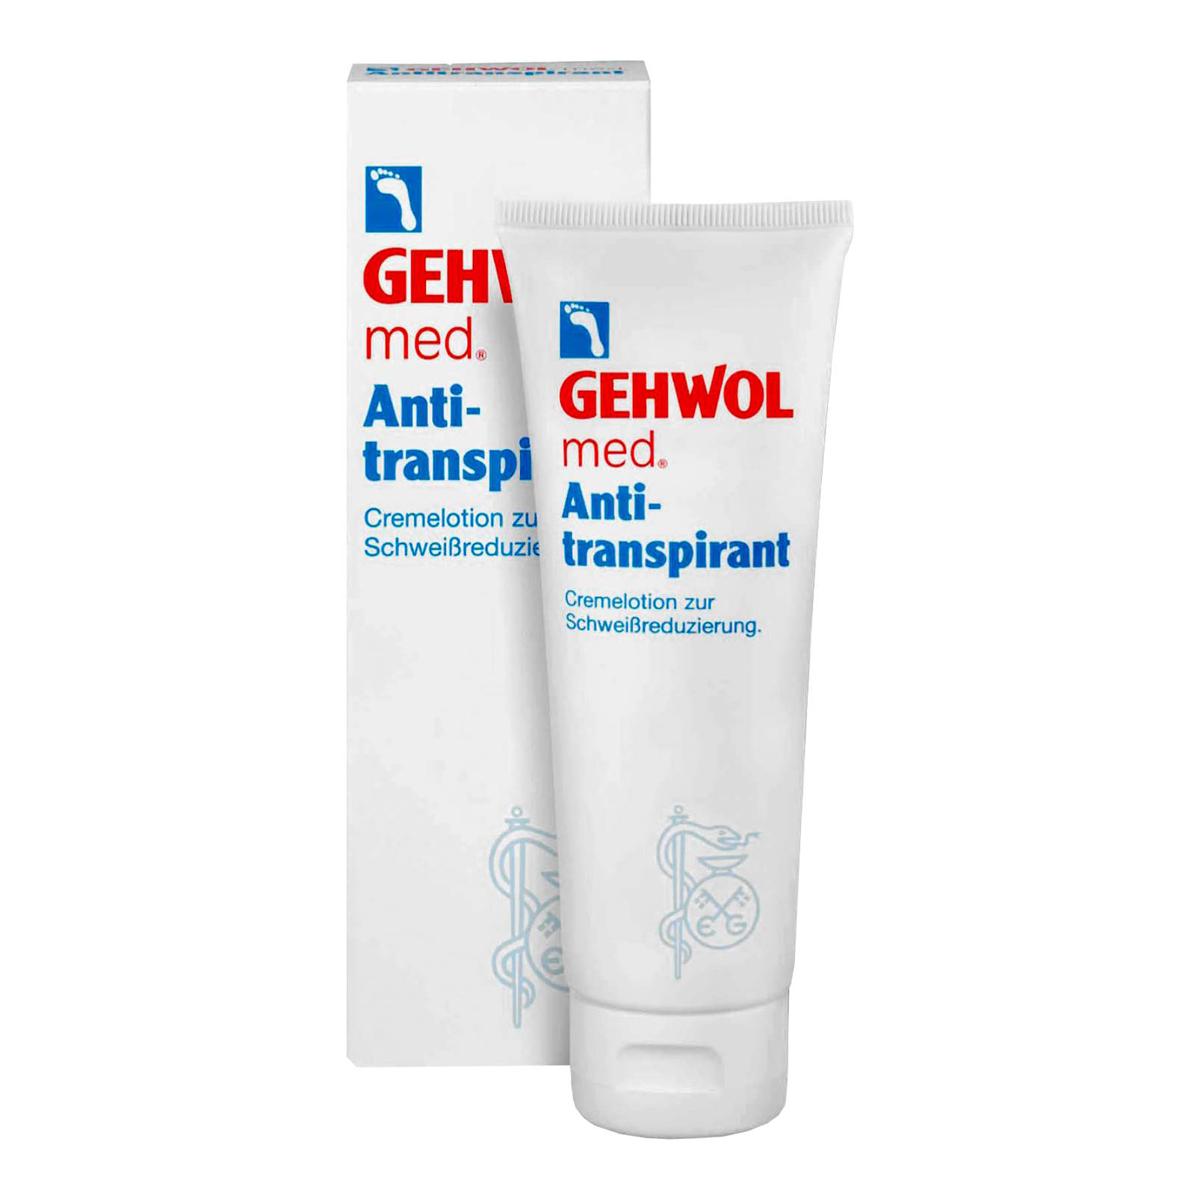 Gehwol Anti-Transpirant - Крем-лосьон антиперспирант для ног 125 мл gehwol zehenschutz ring кольца для пальцев защитные малые 2 шт